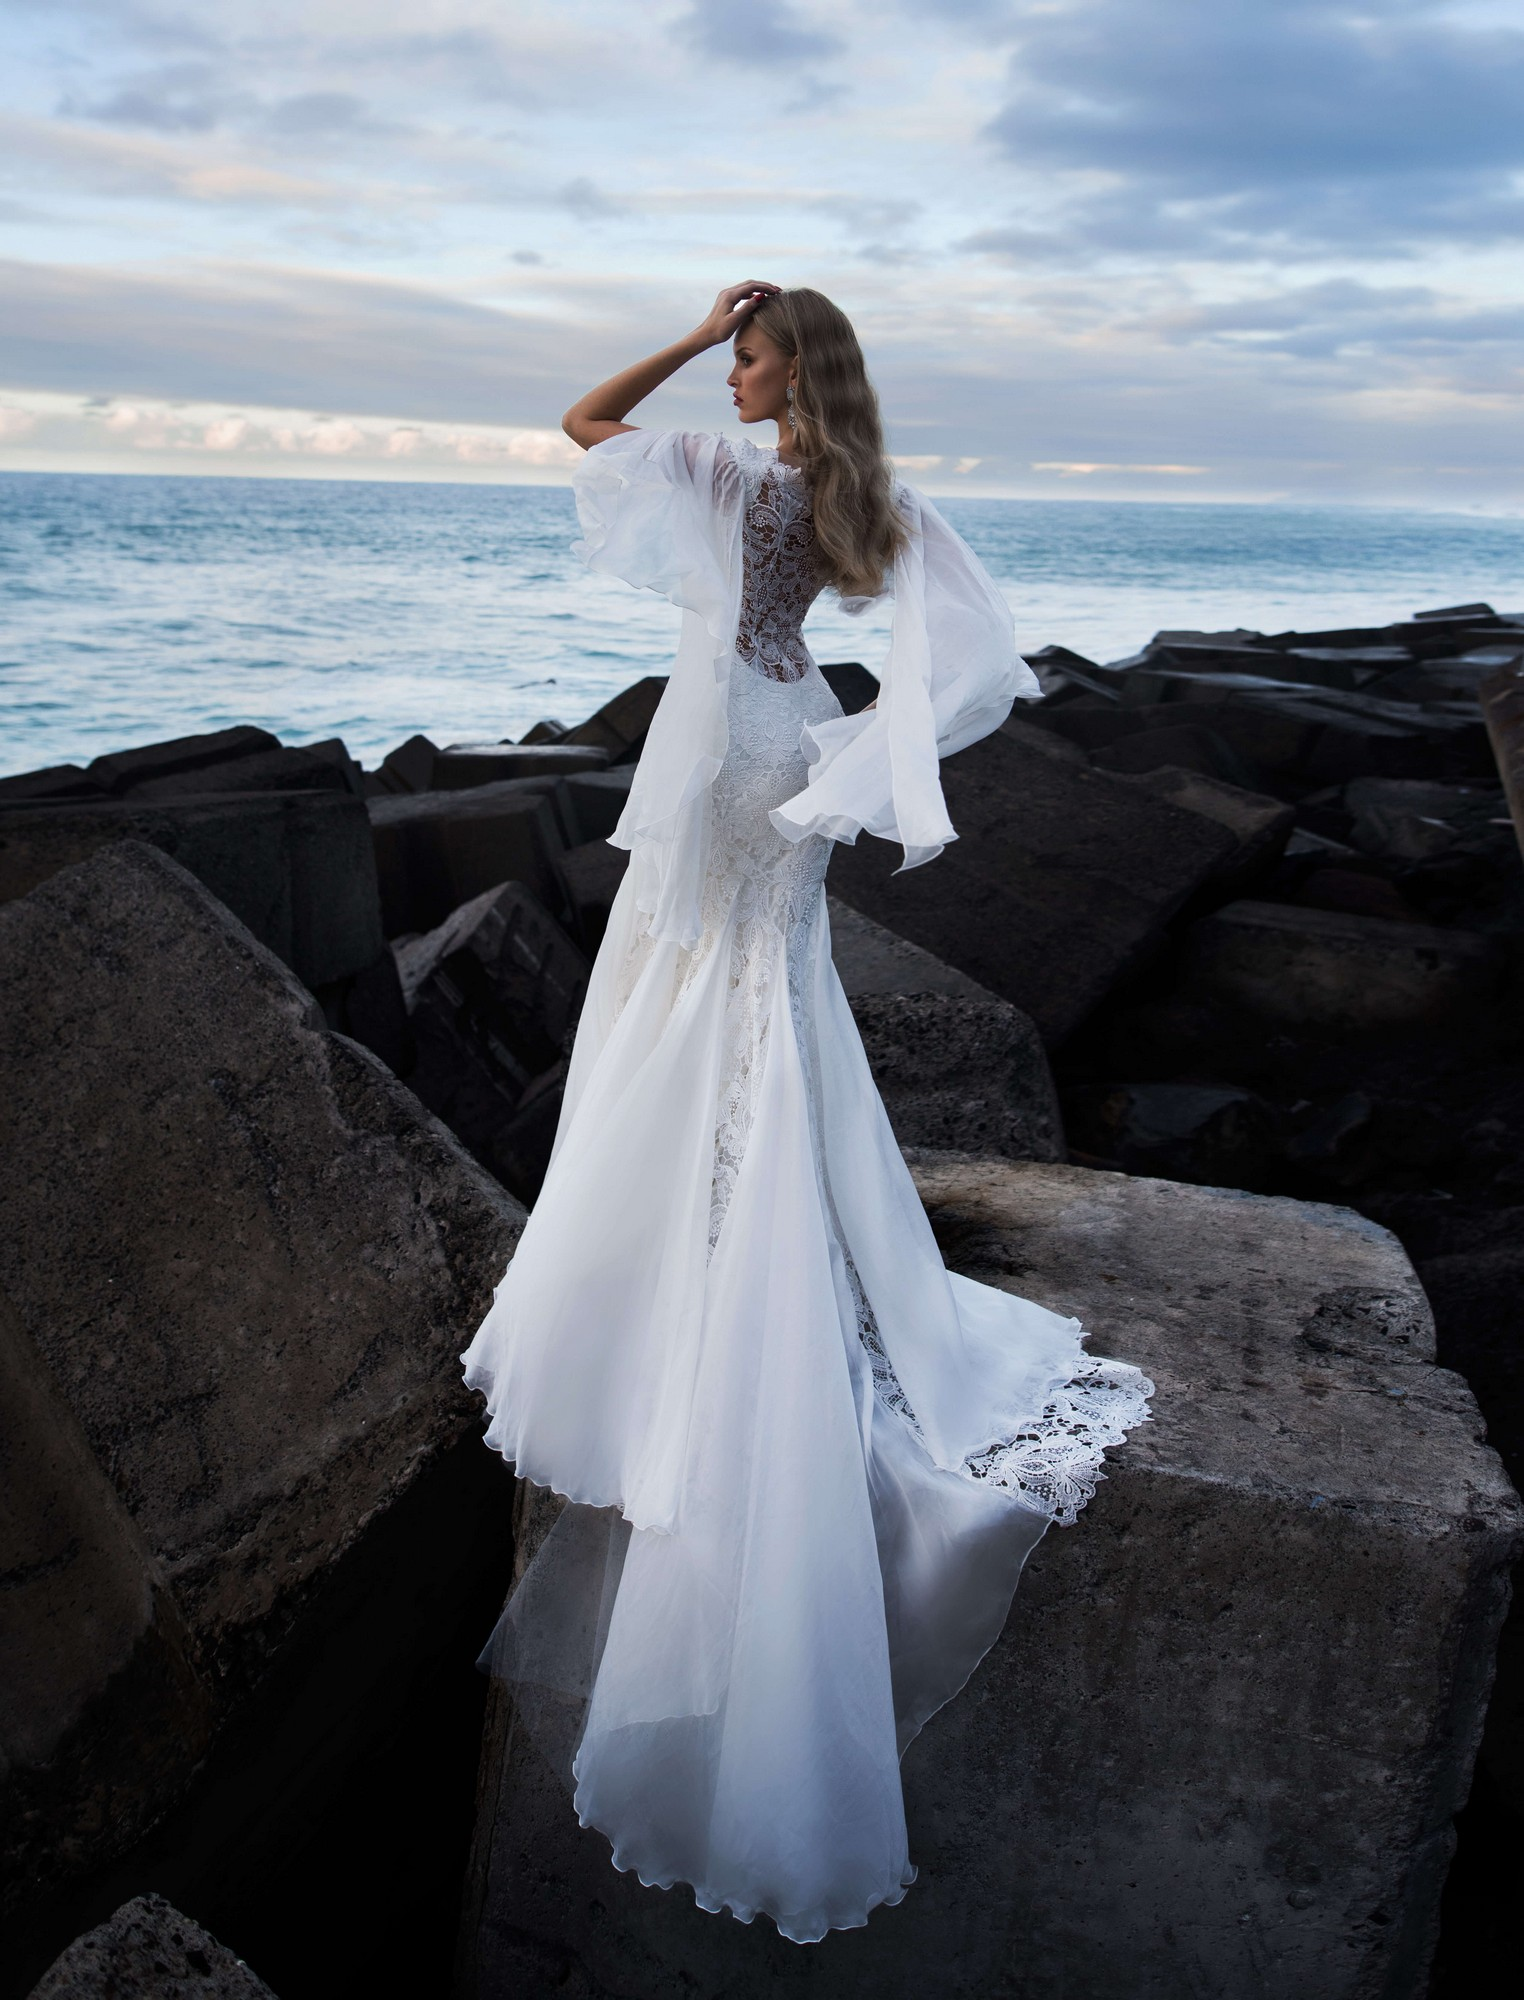 Blait - Dream Ocean Collection by Blammo-Biamo